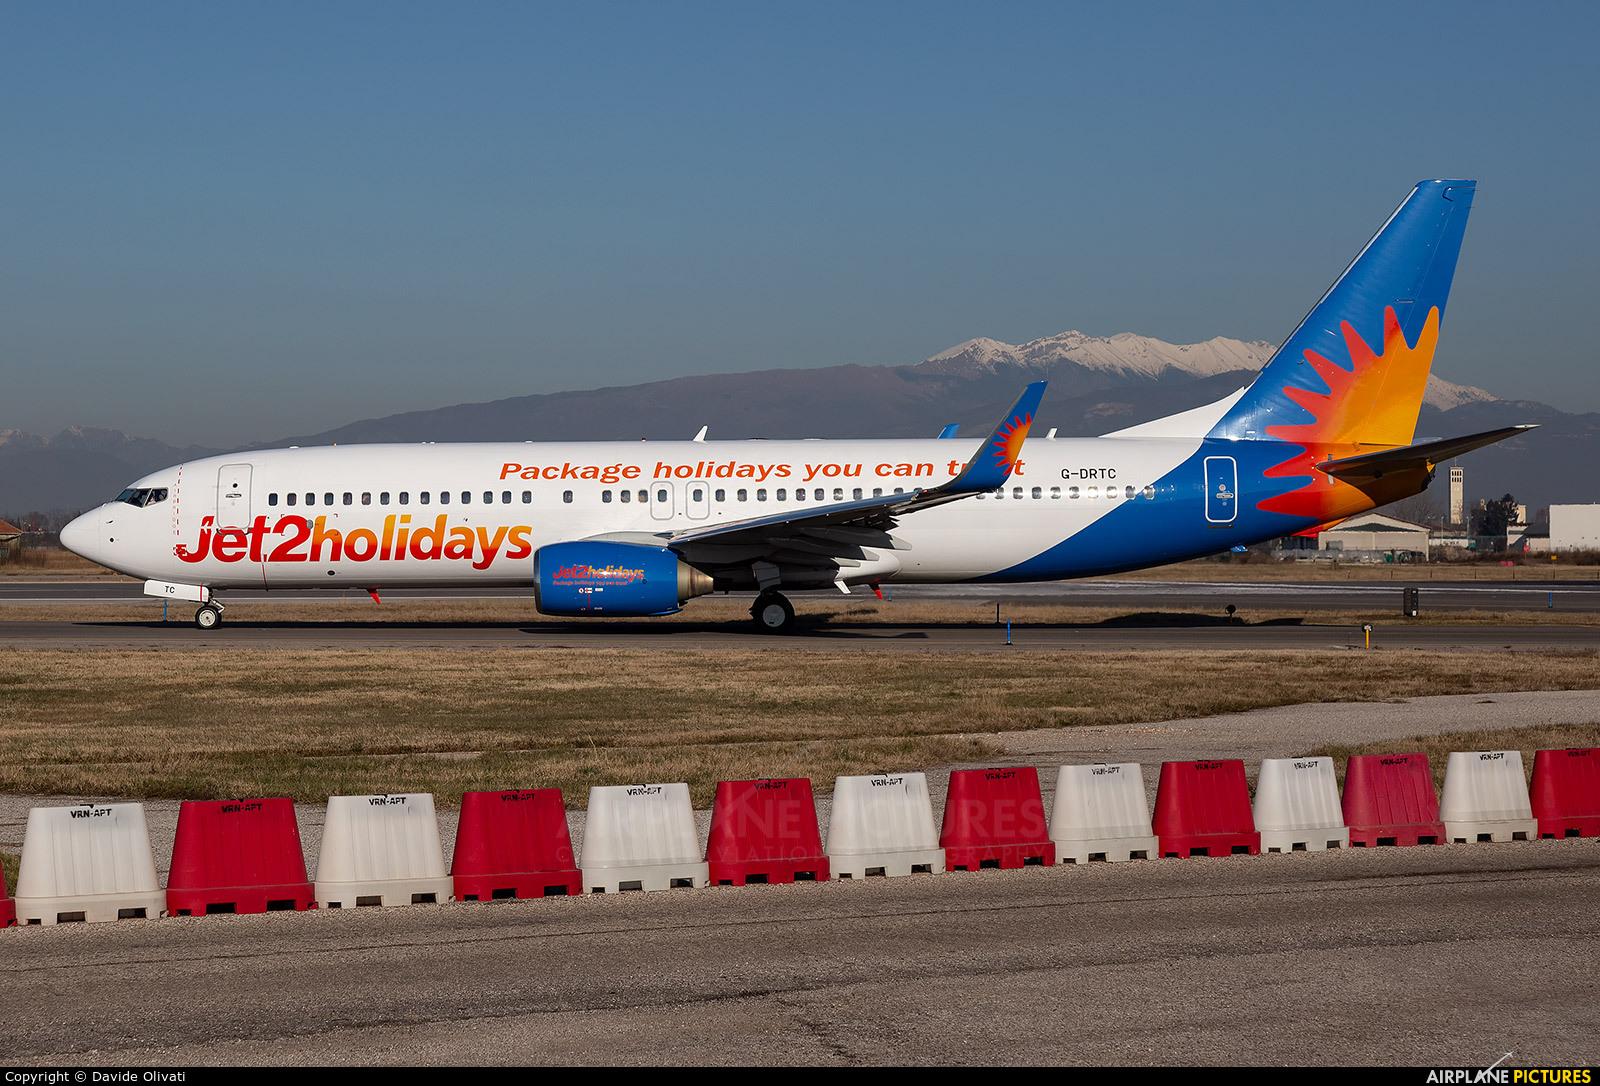 Jet2 Holidays G-DRTC aircraft at Verona - Villafranca